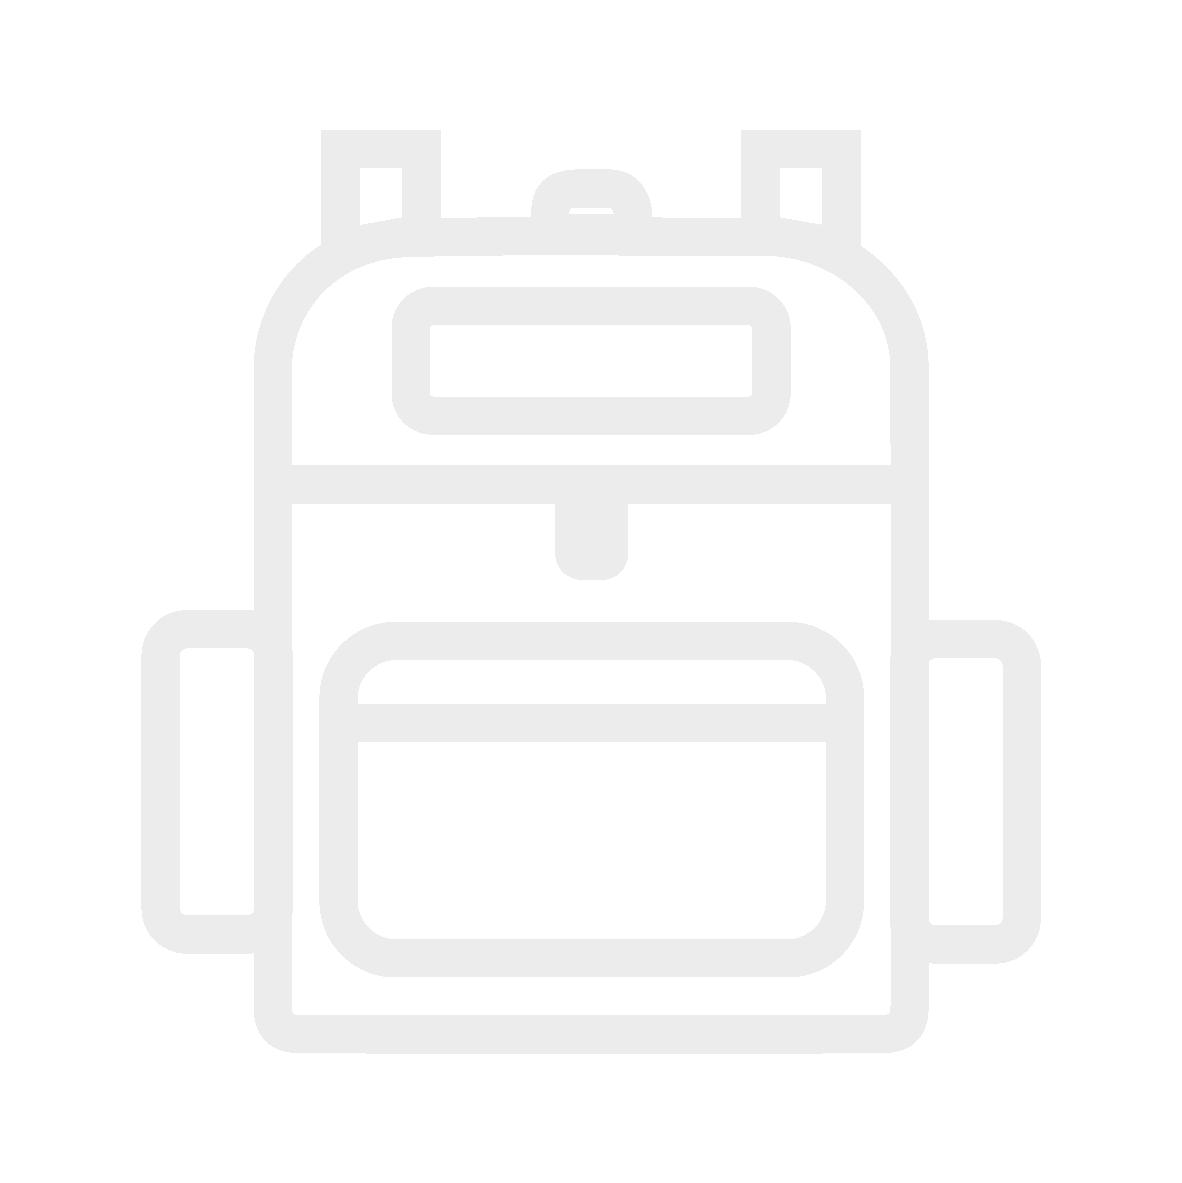 SwissPeaks_Icons Symboles_Grey_Bagpack.png